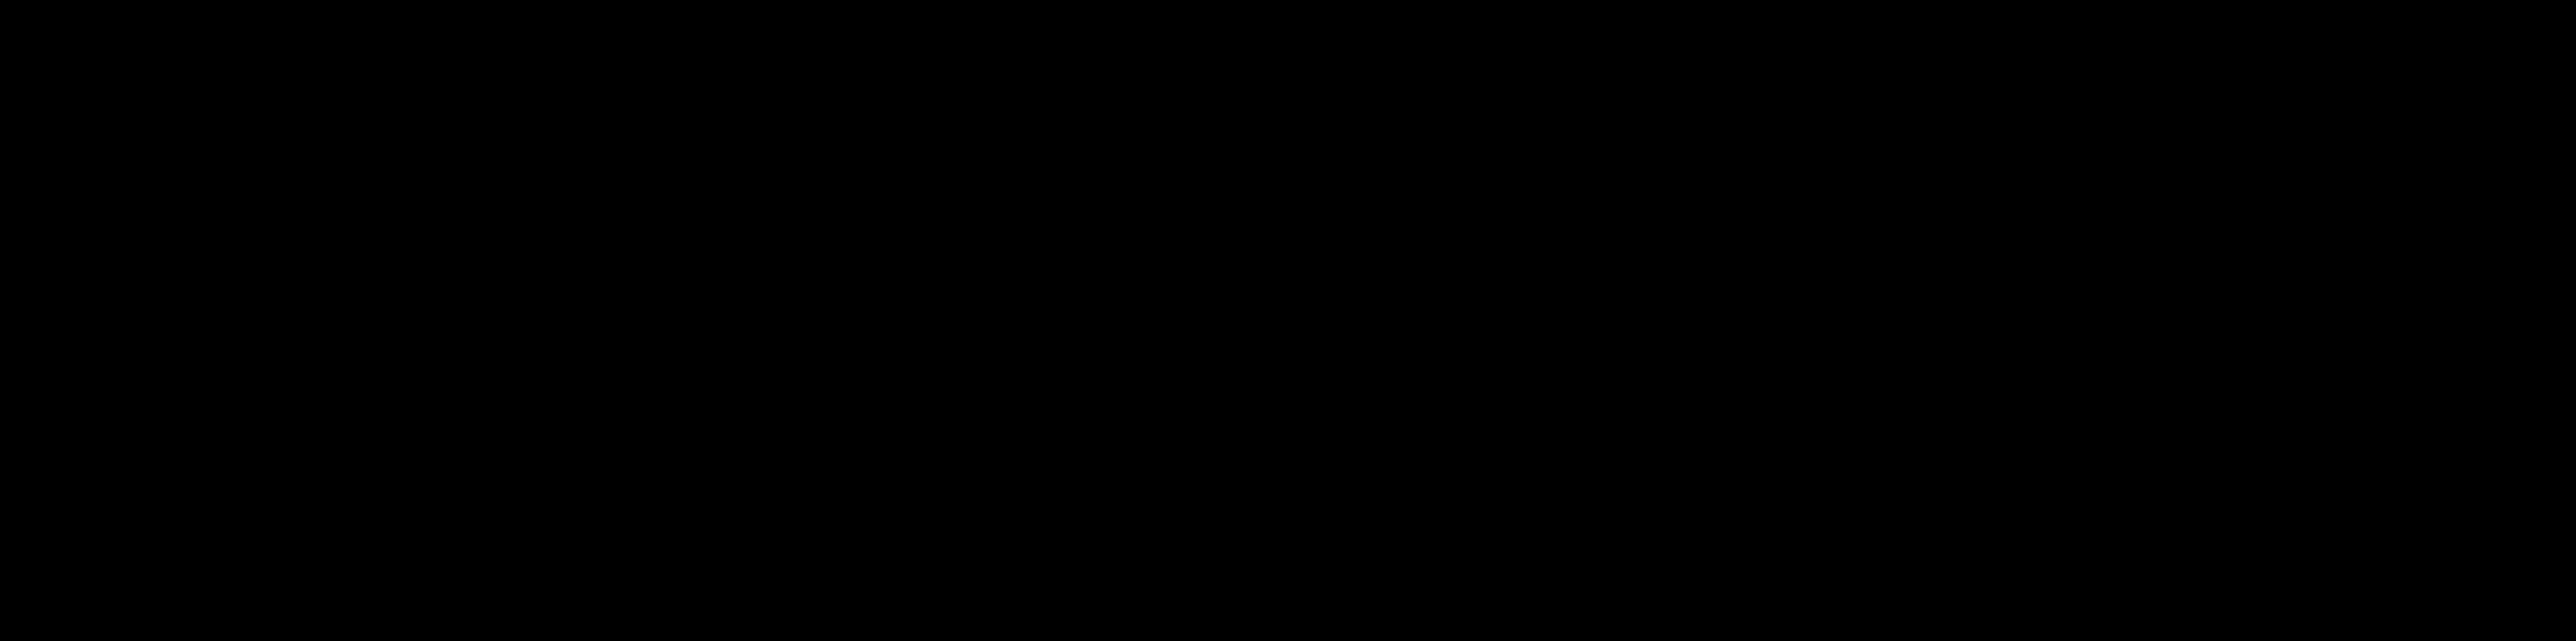 Fmoc-tetra L-alanine tert-butyl ester